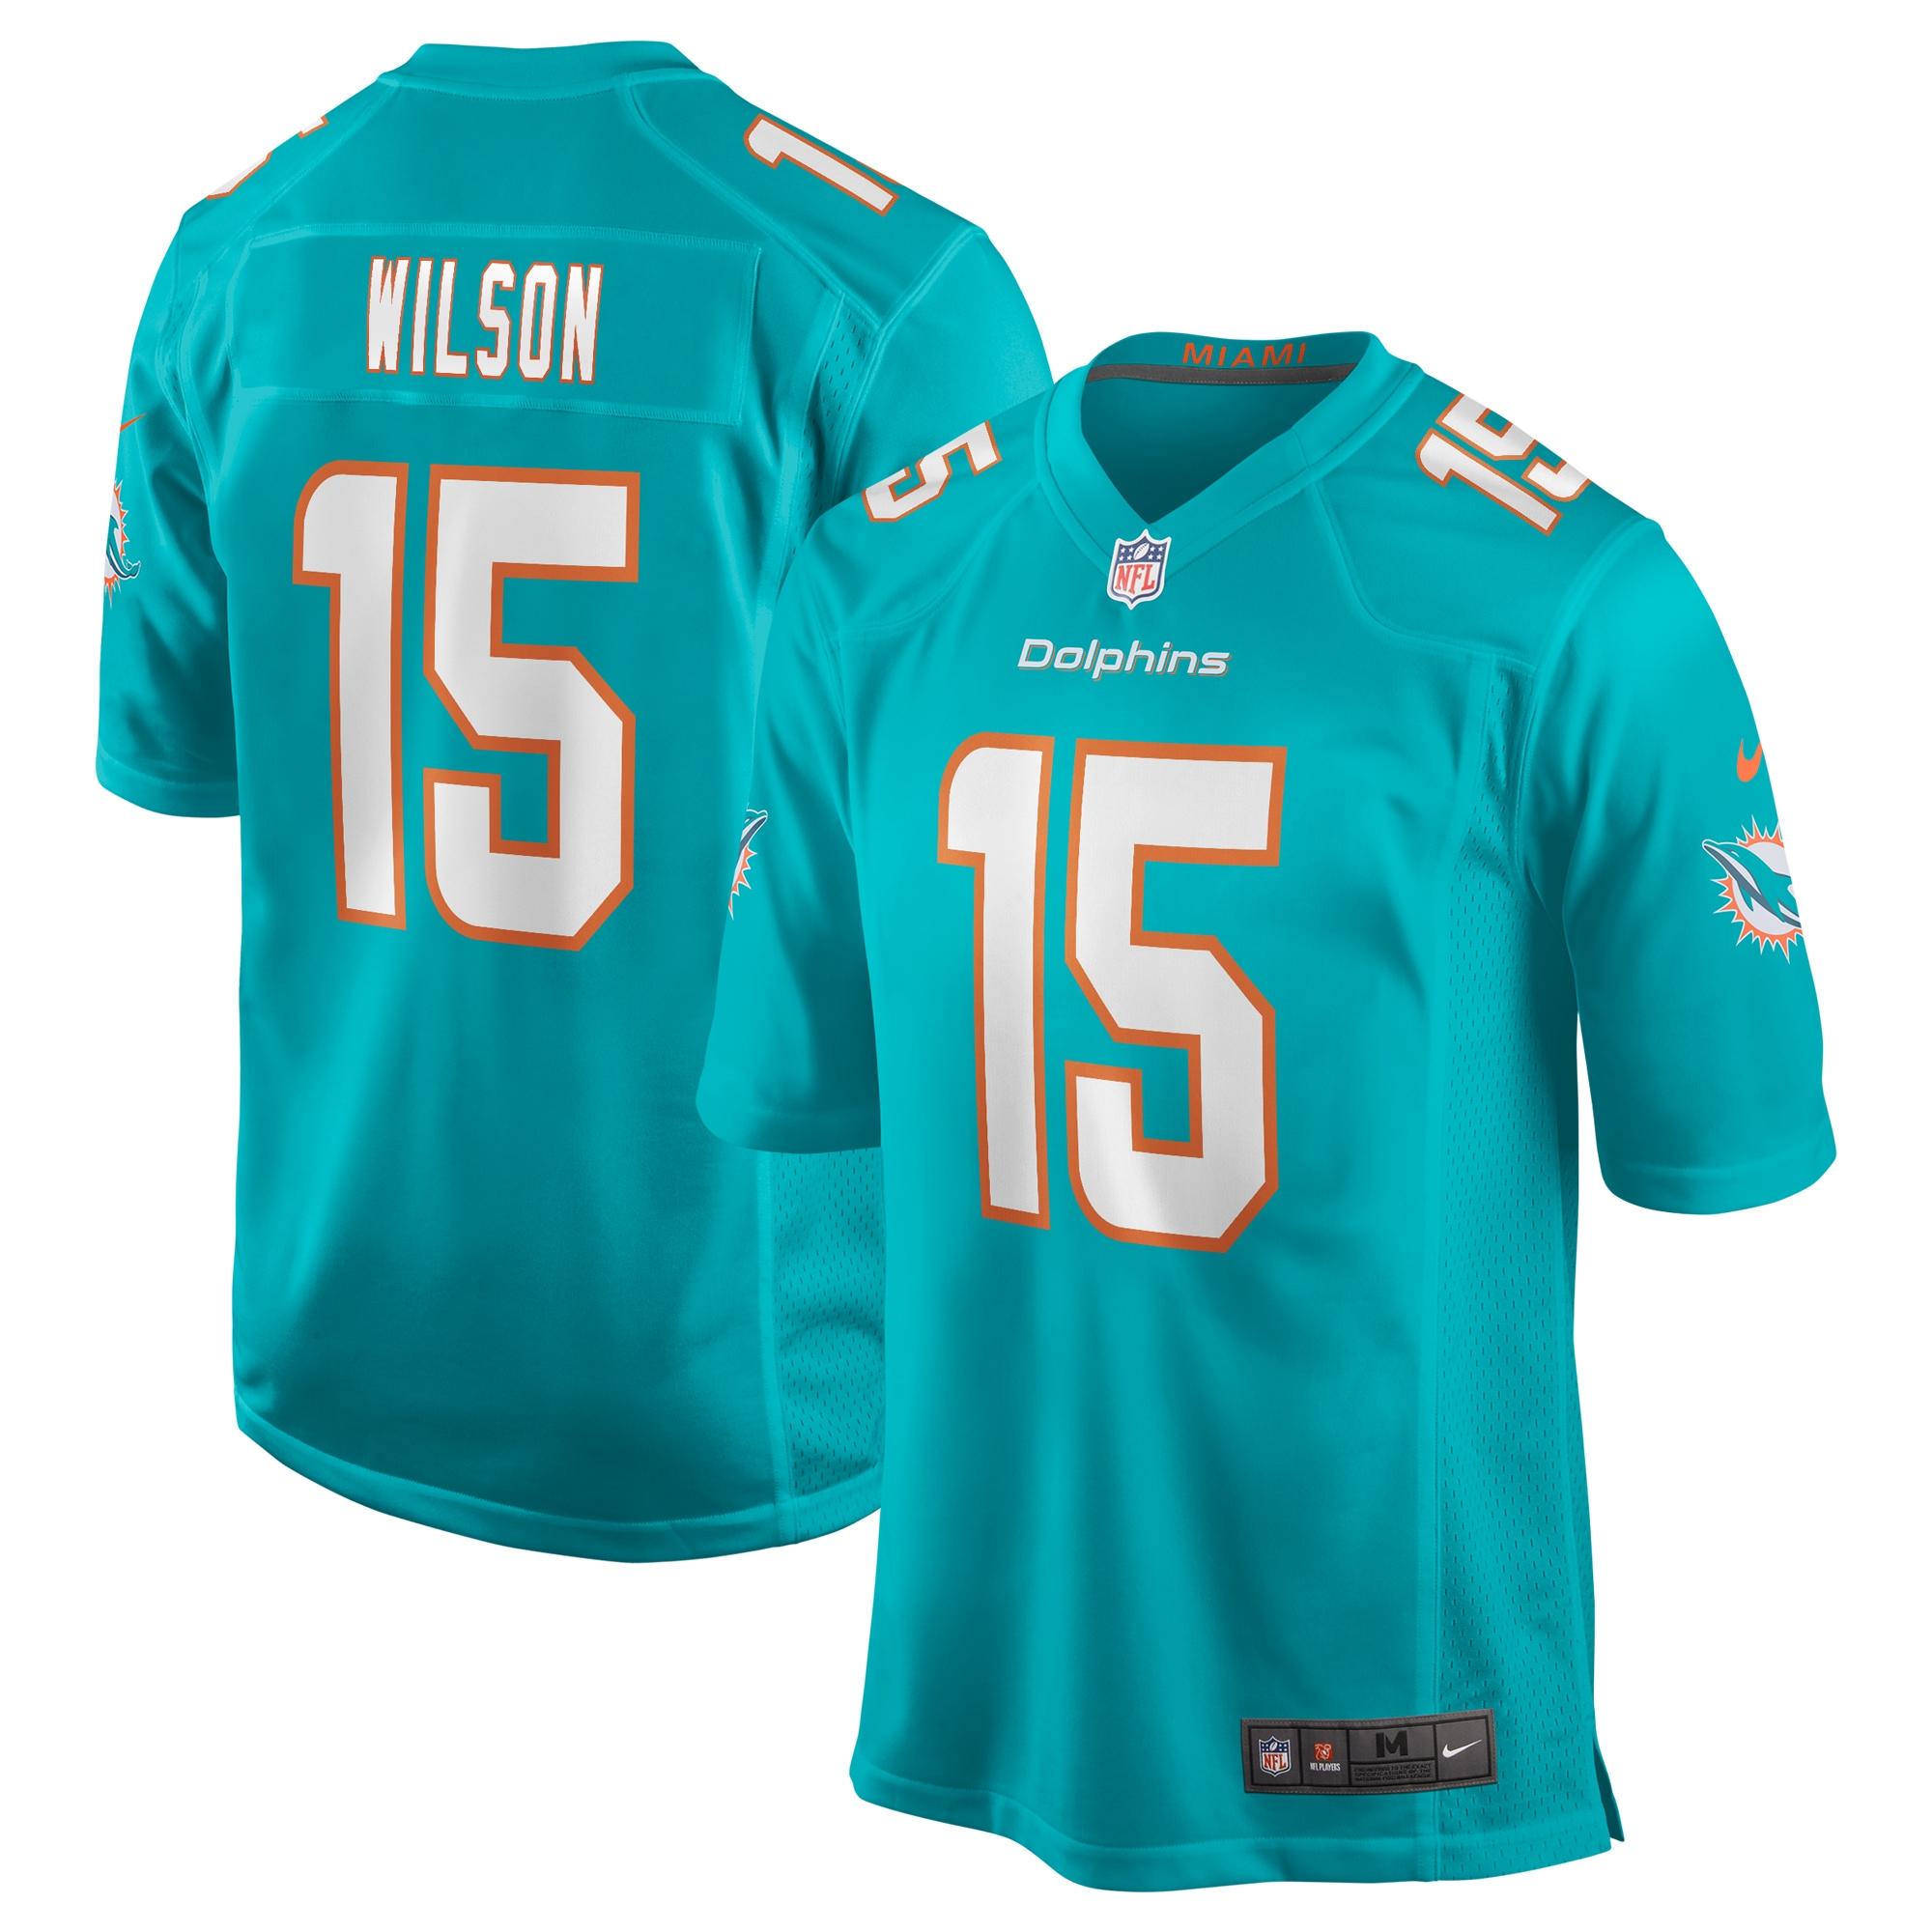 Albert Wilson Miami Dolphins Nike Game Jersey - Aqua